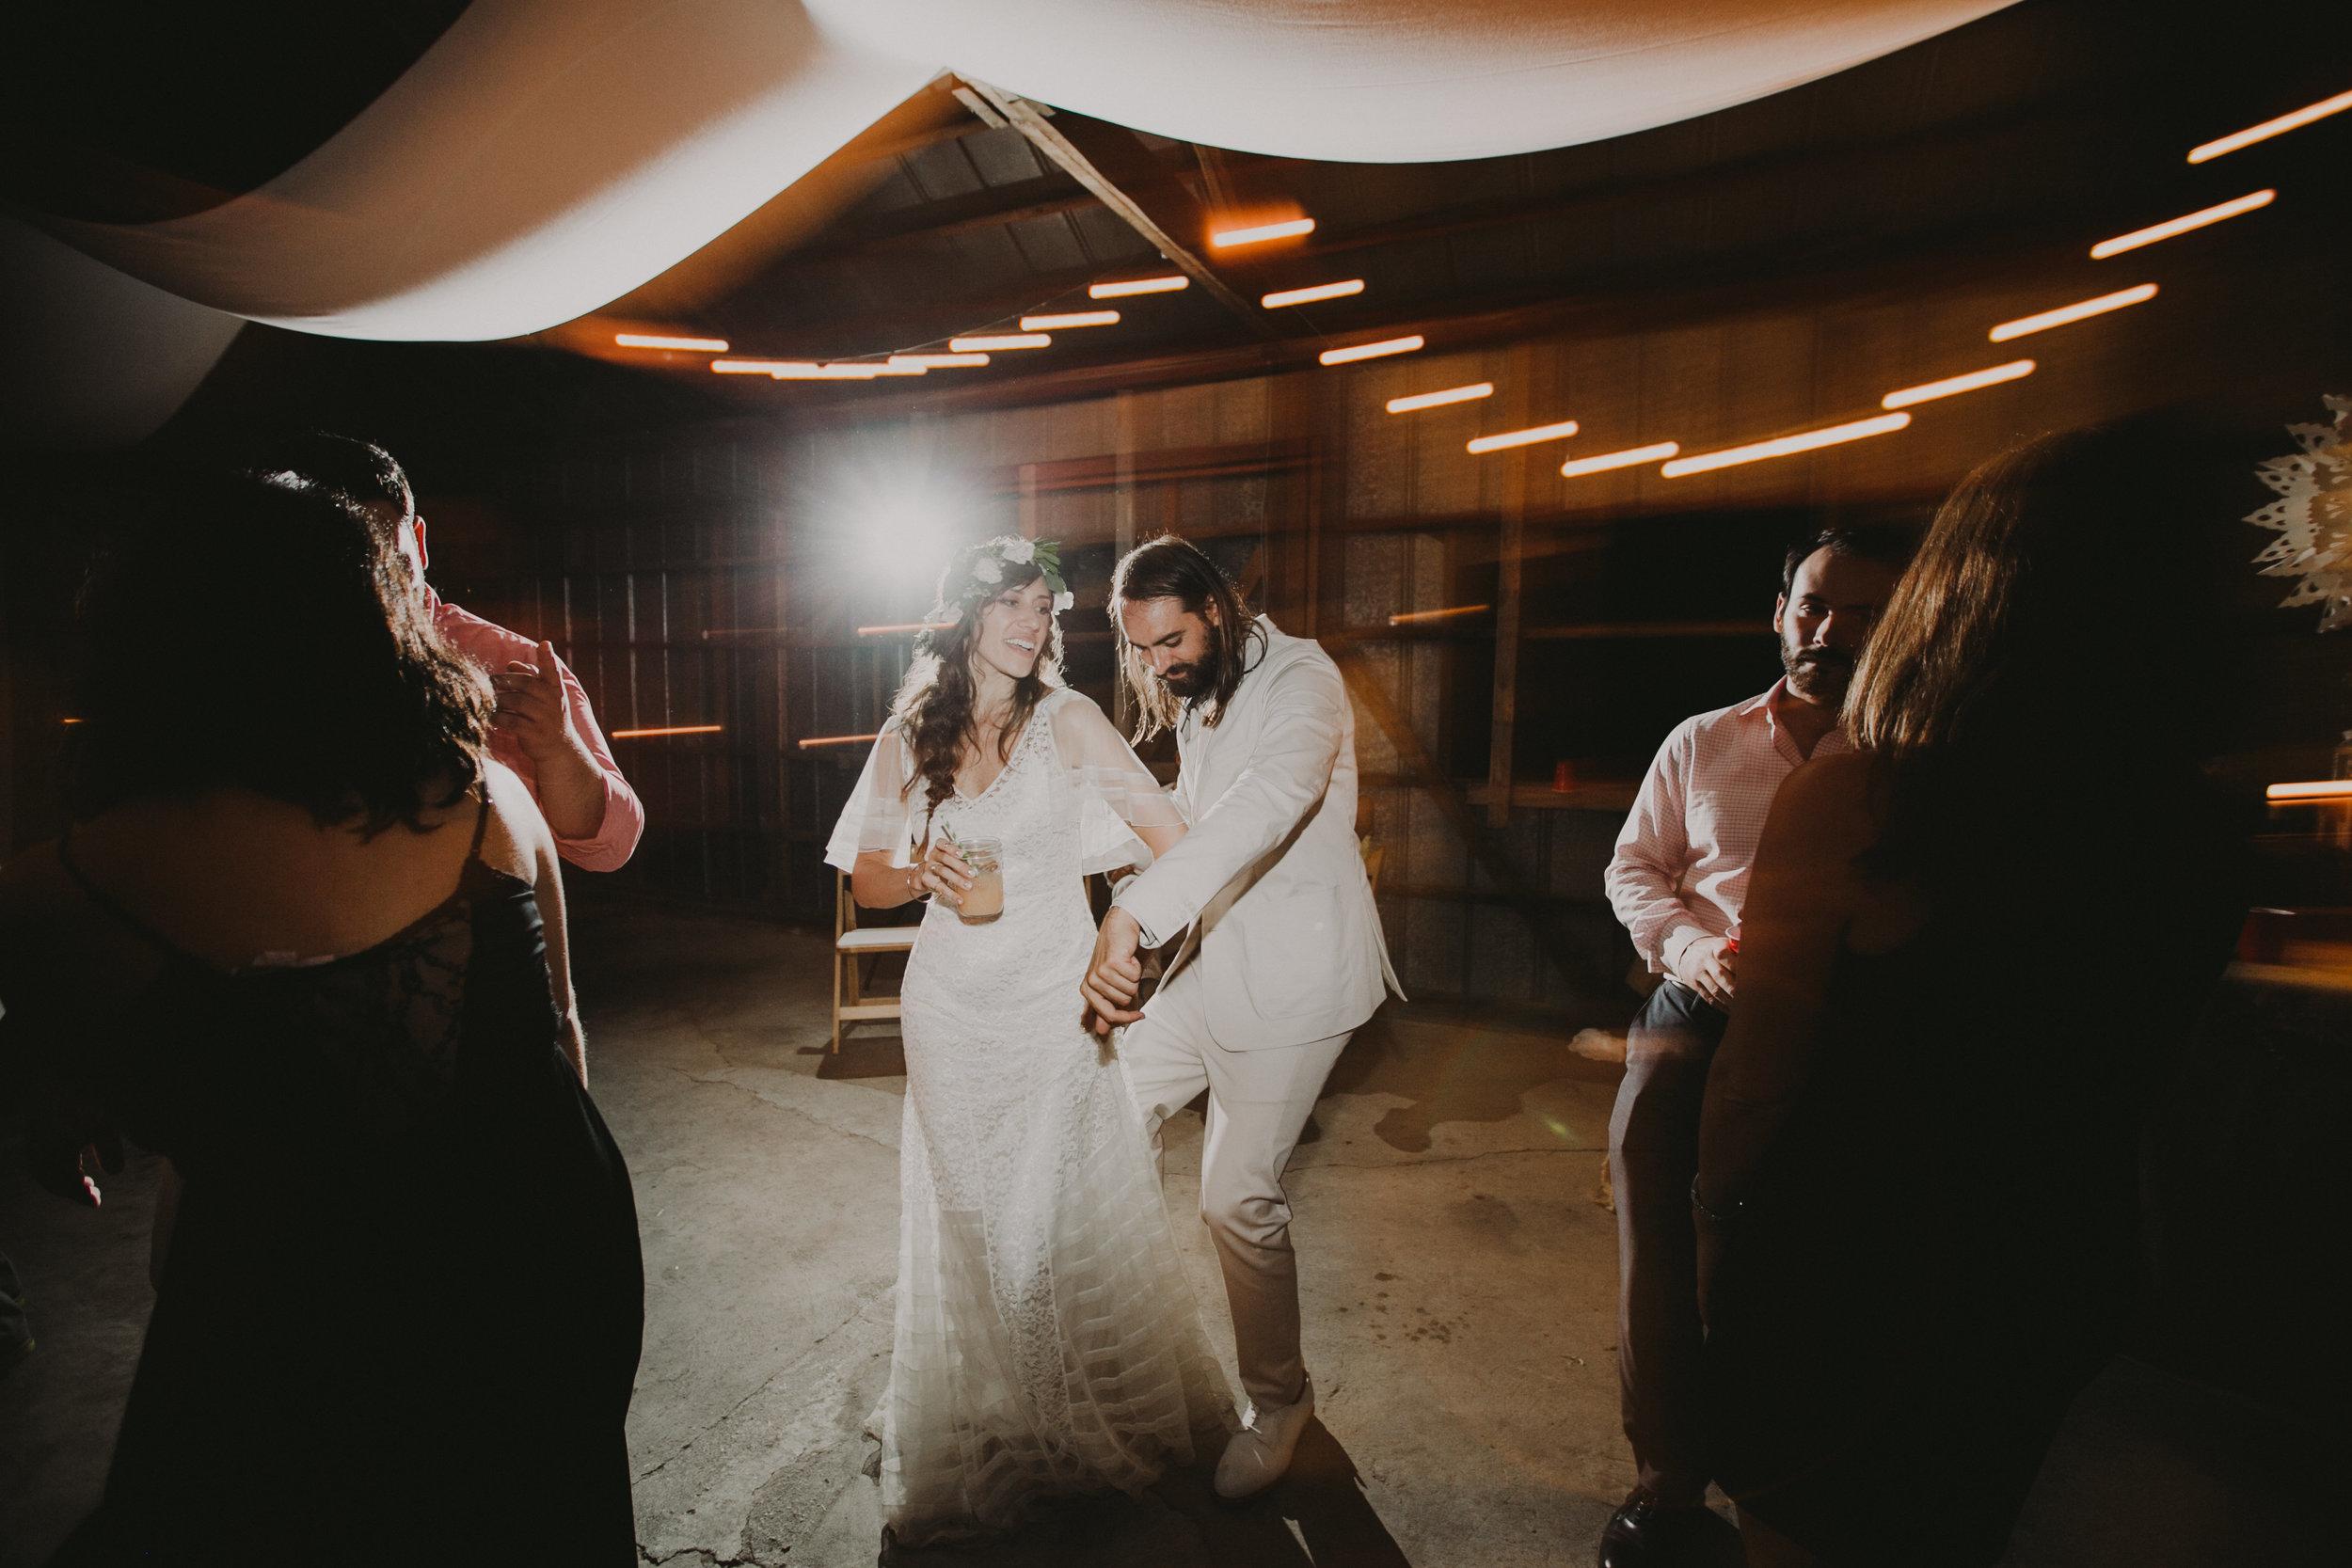 LIBERTY_VIEW_FARM_HIGHLAND_NY_WEDDING_CHELLISE_MICHAEL_PHOTOGRAPHY922.JPG